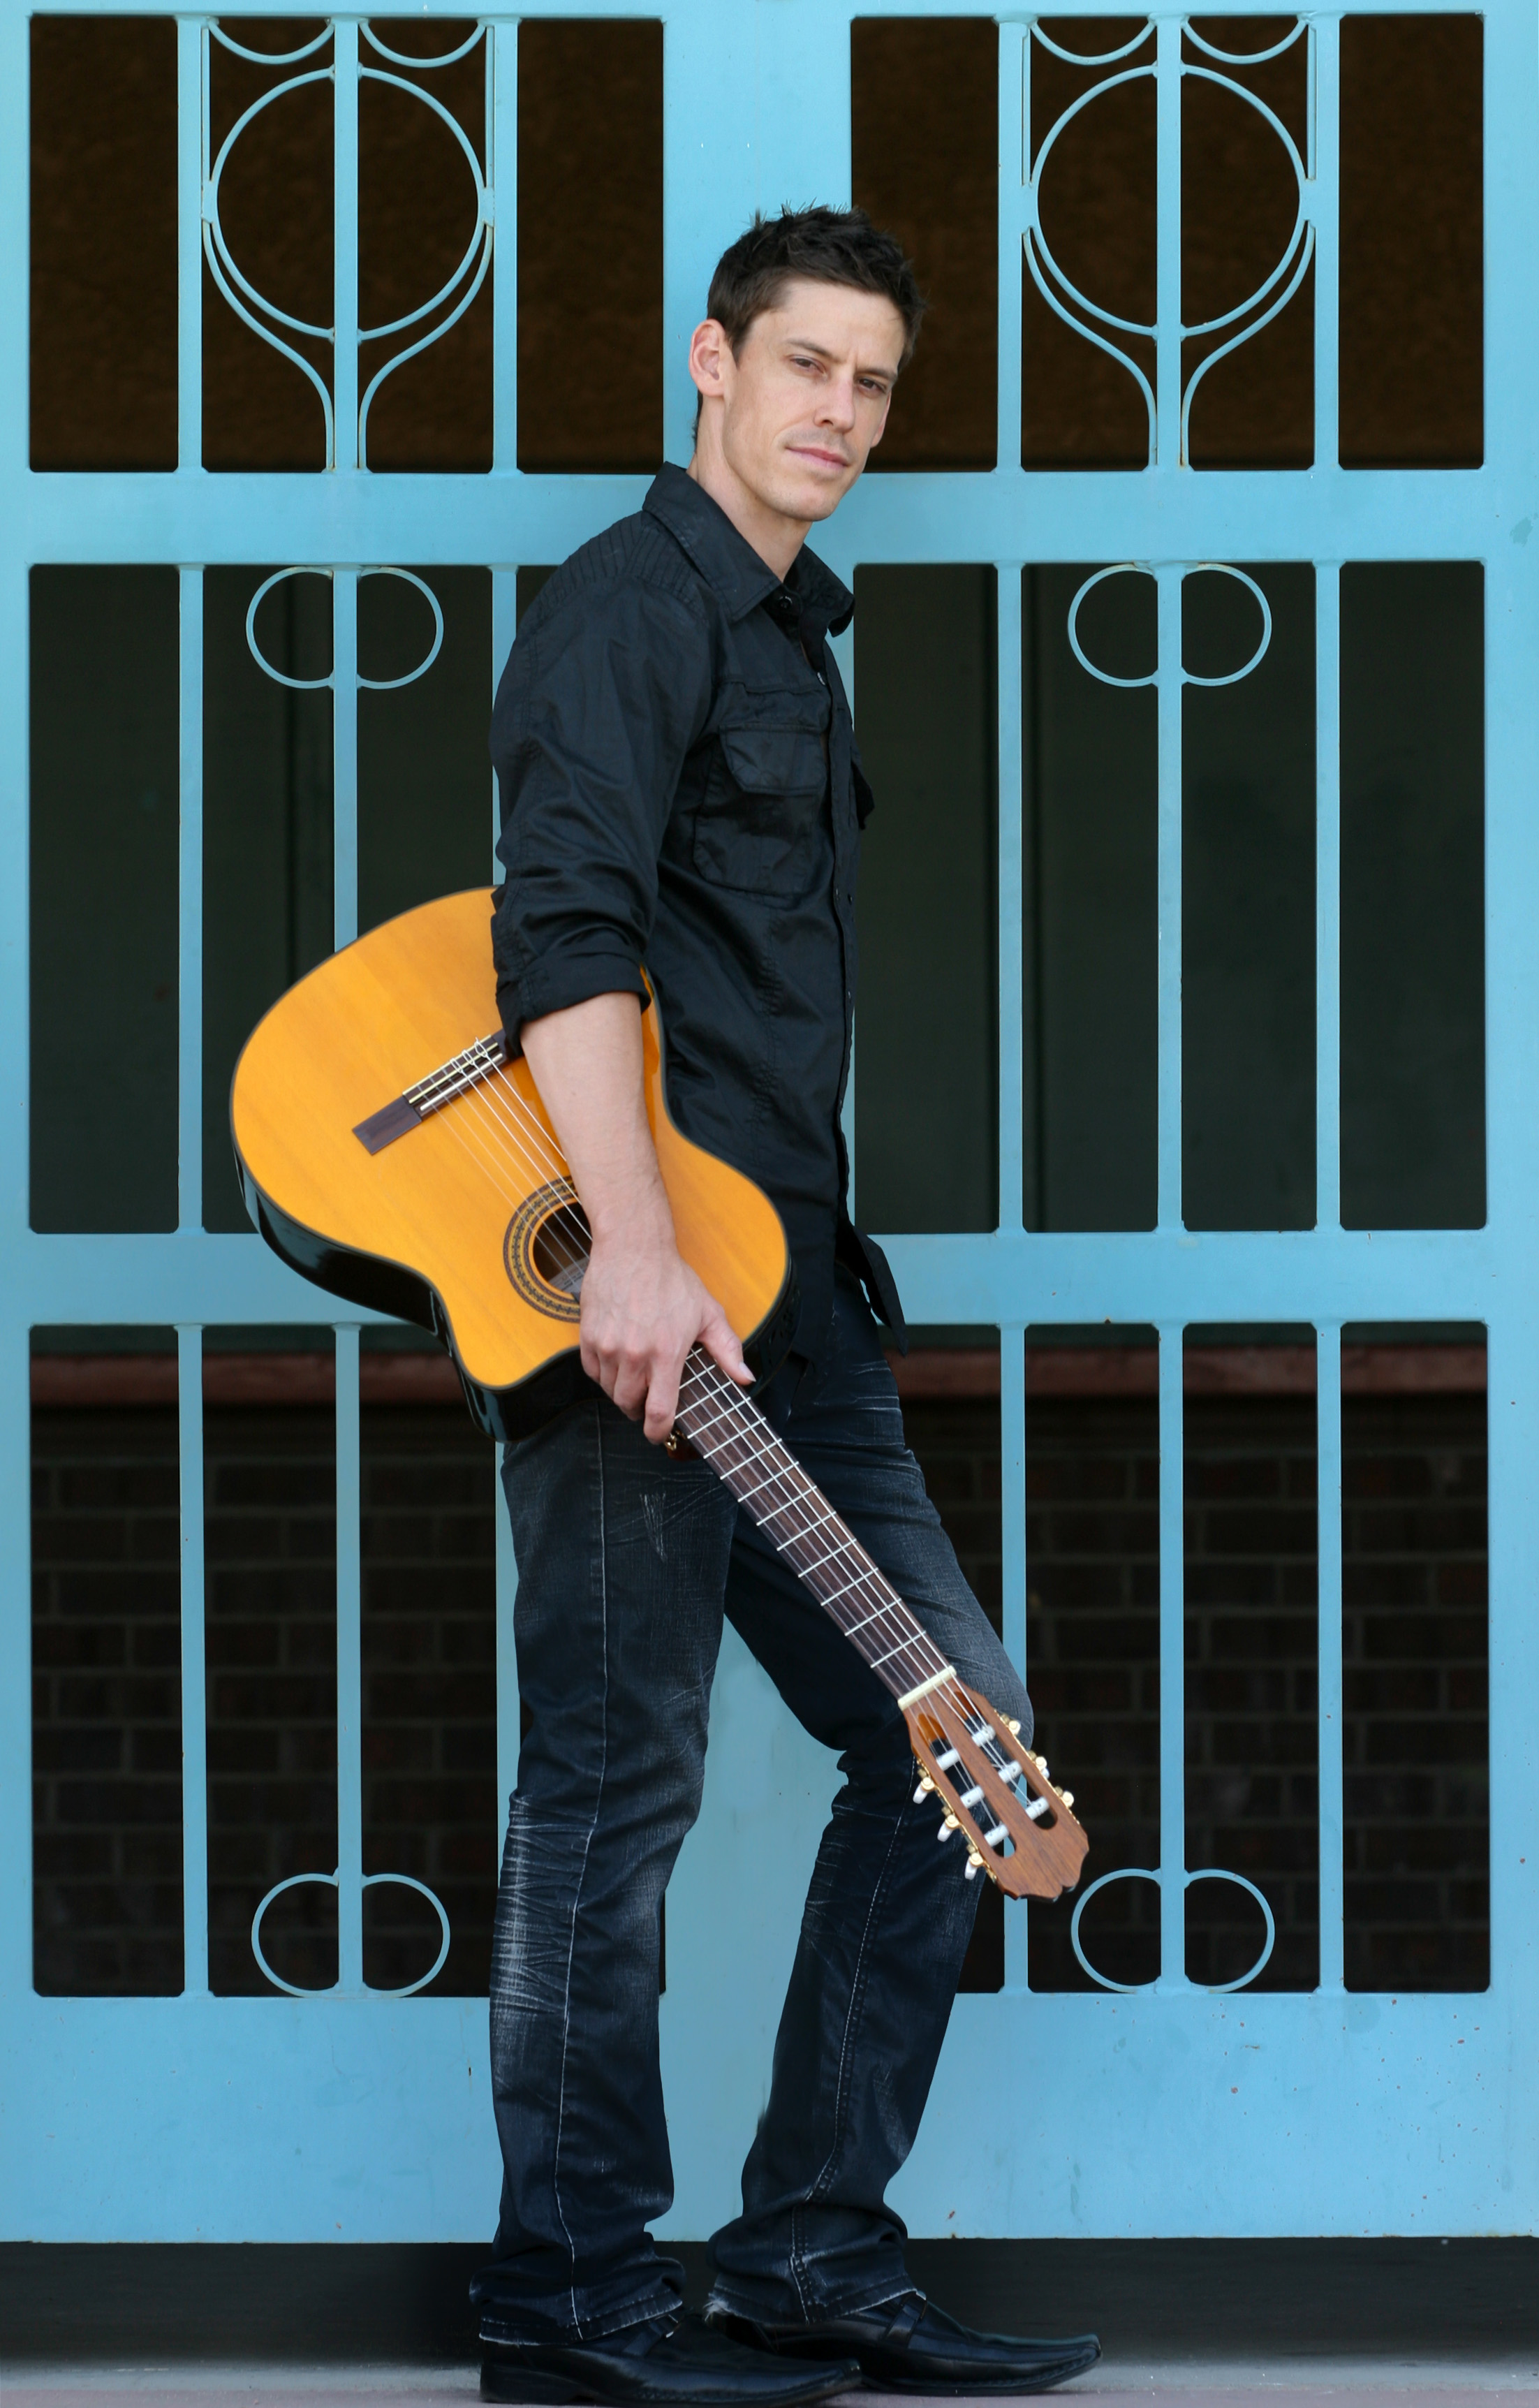 Andy Hackbarth Blue Gate Promo.jpg